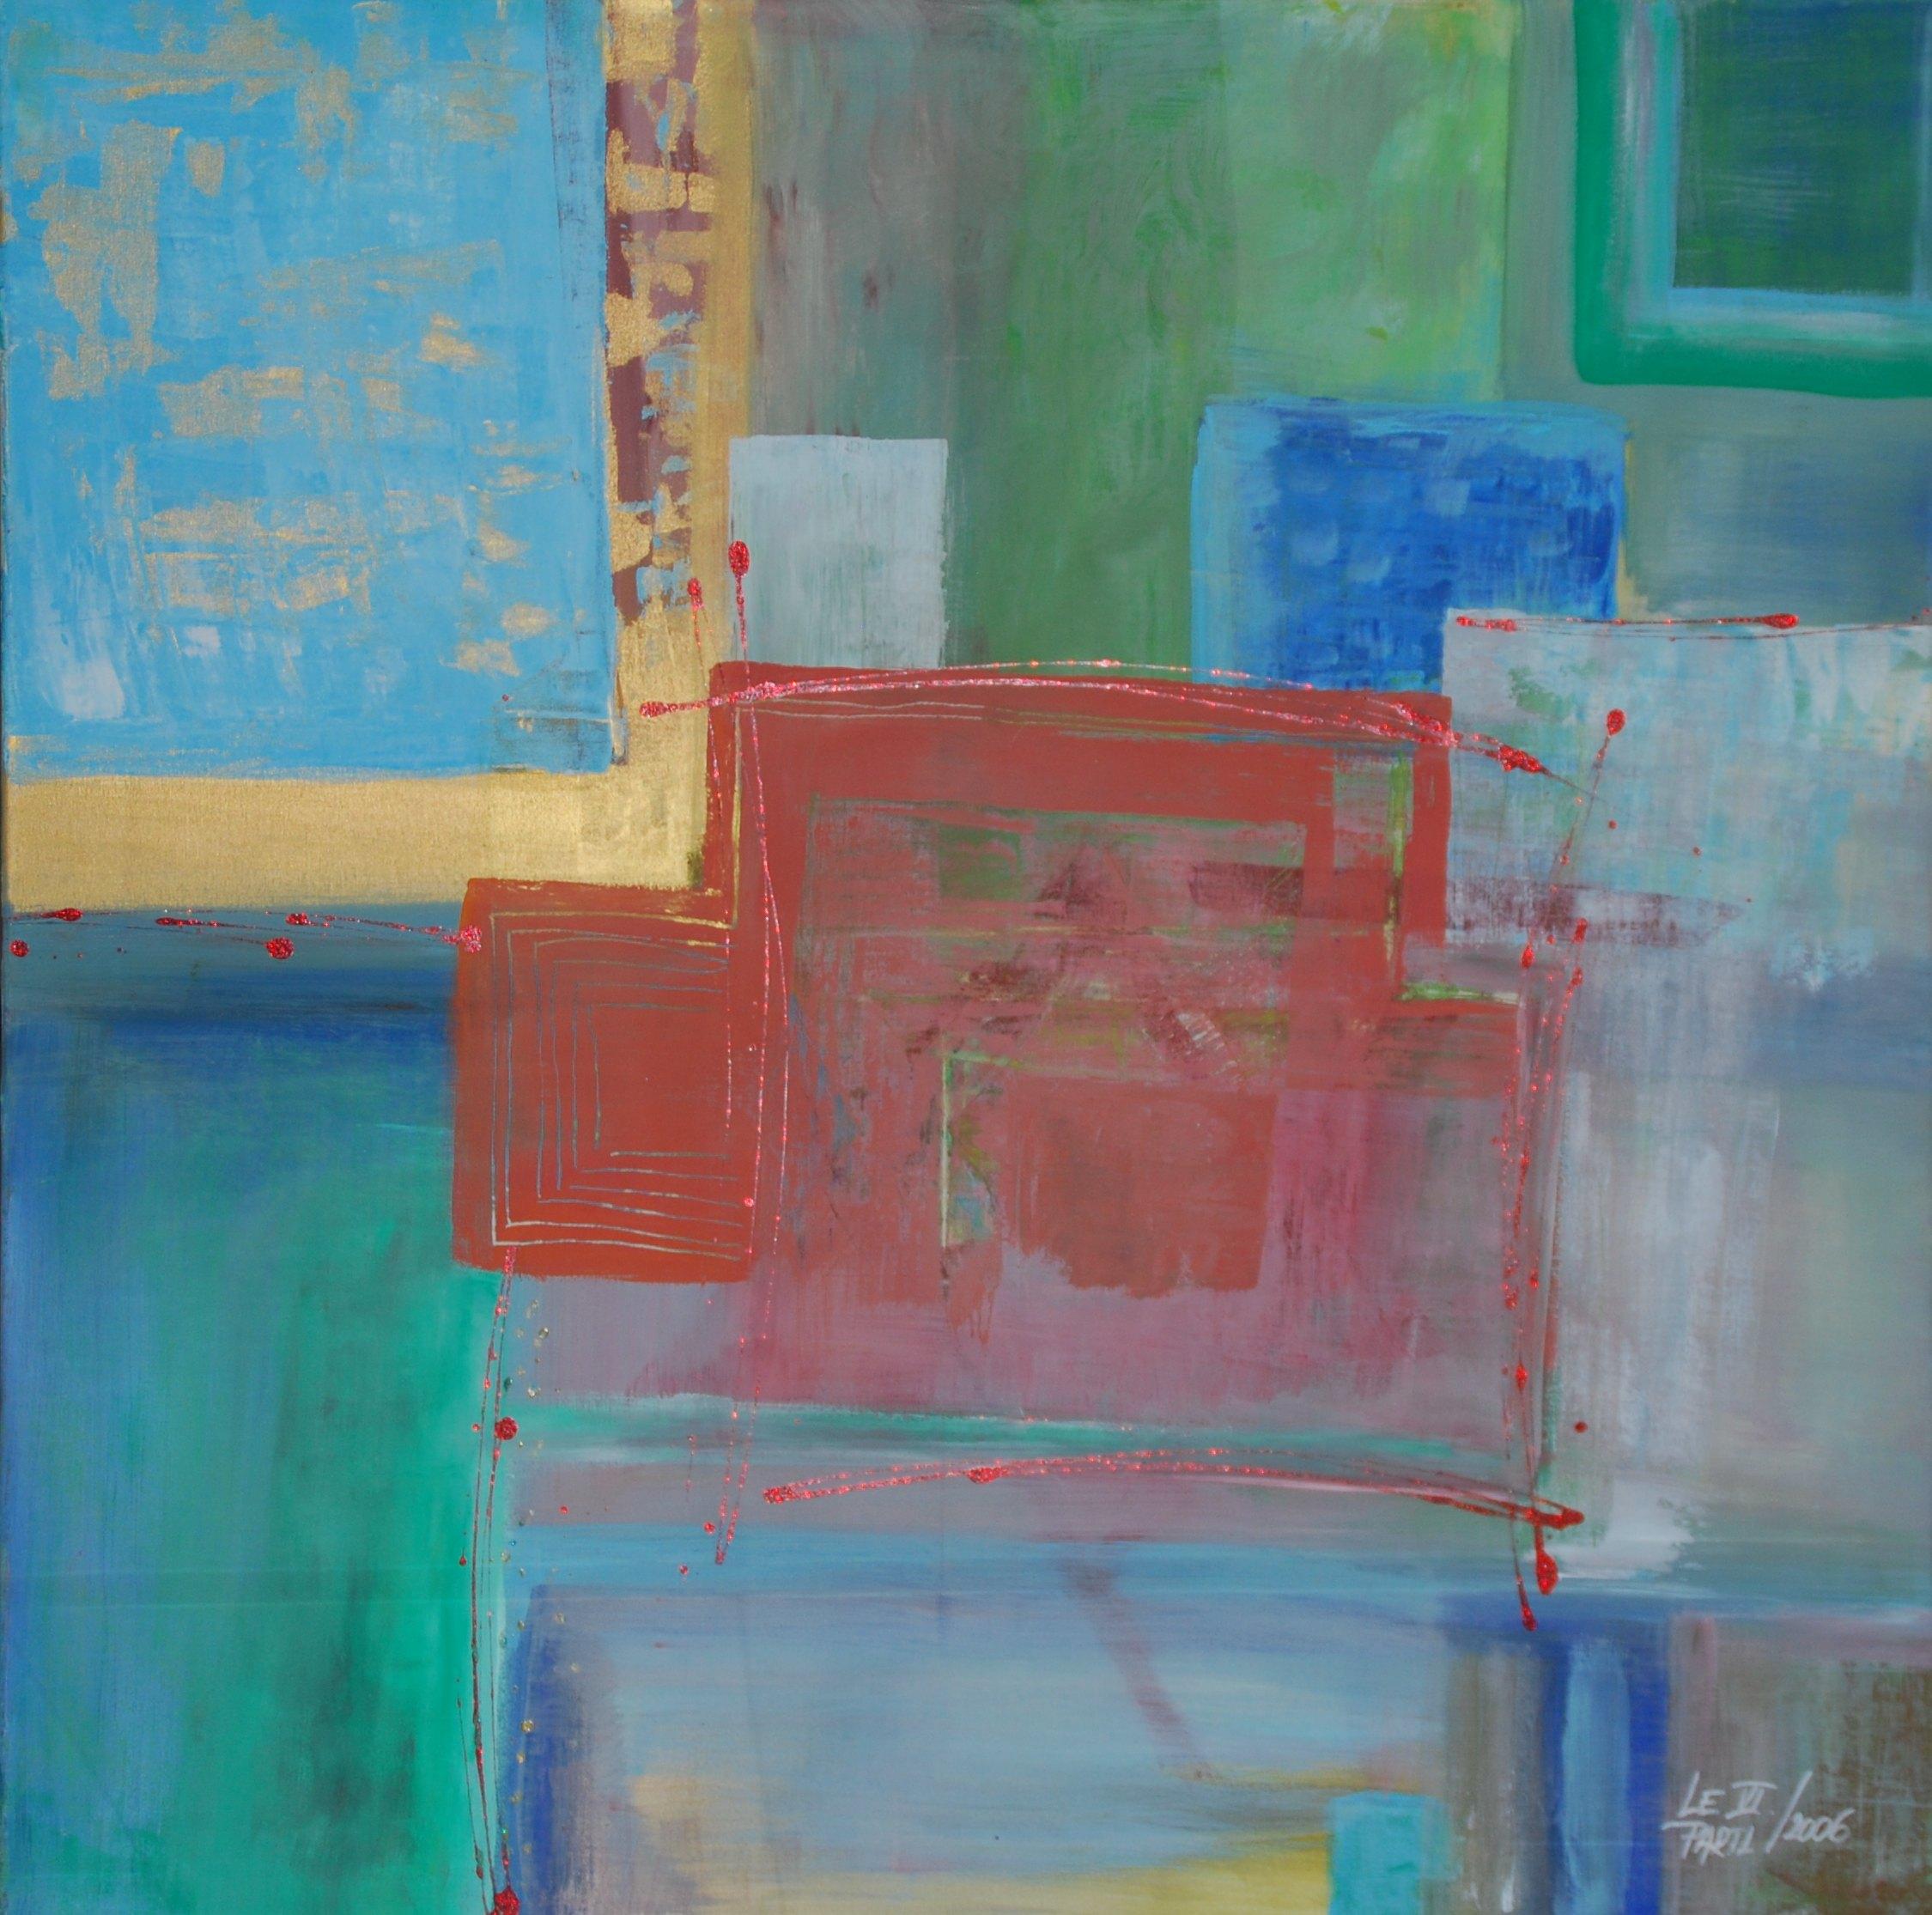 Blue Heaven artwork by Lenka Le Partl - art listed for sale on Artplode